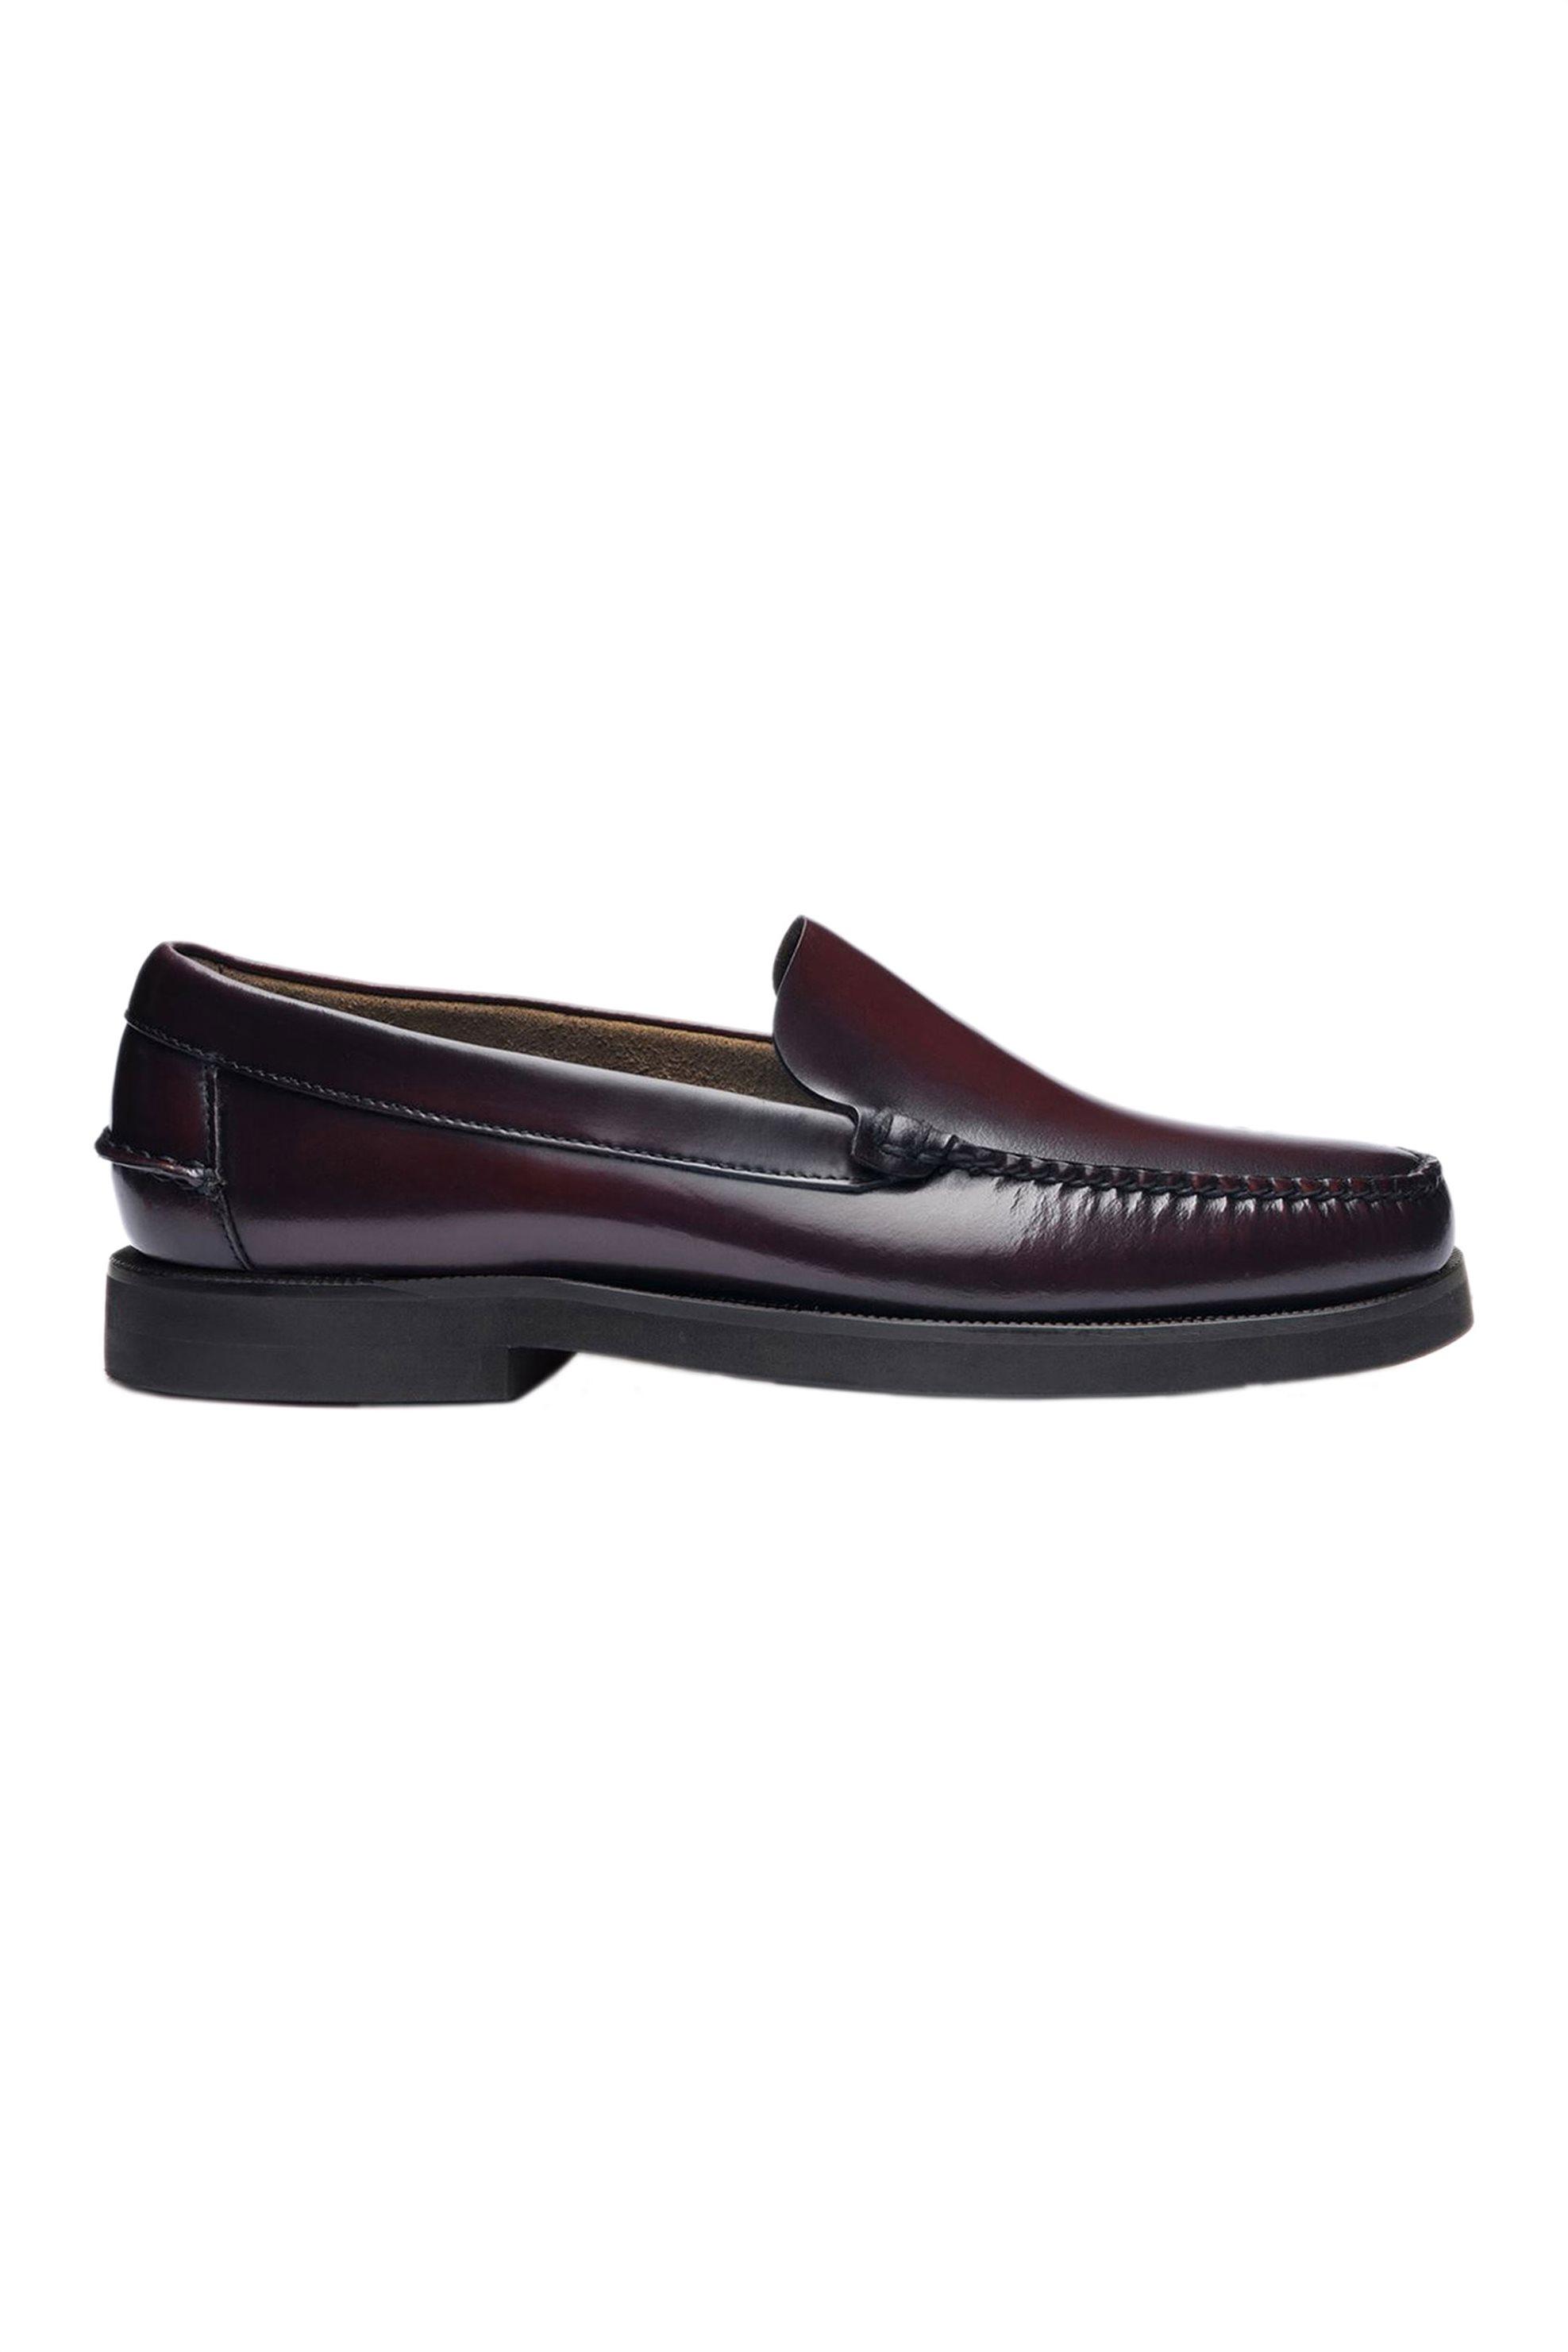 "Sebago® ανδρικά penny loafers δερμάτινα ""Frank Polaris"" – L7001G70-903R – Μπορντό"